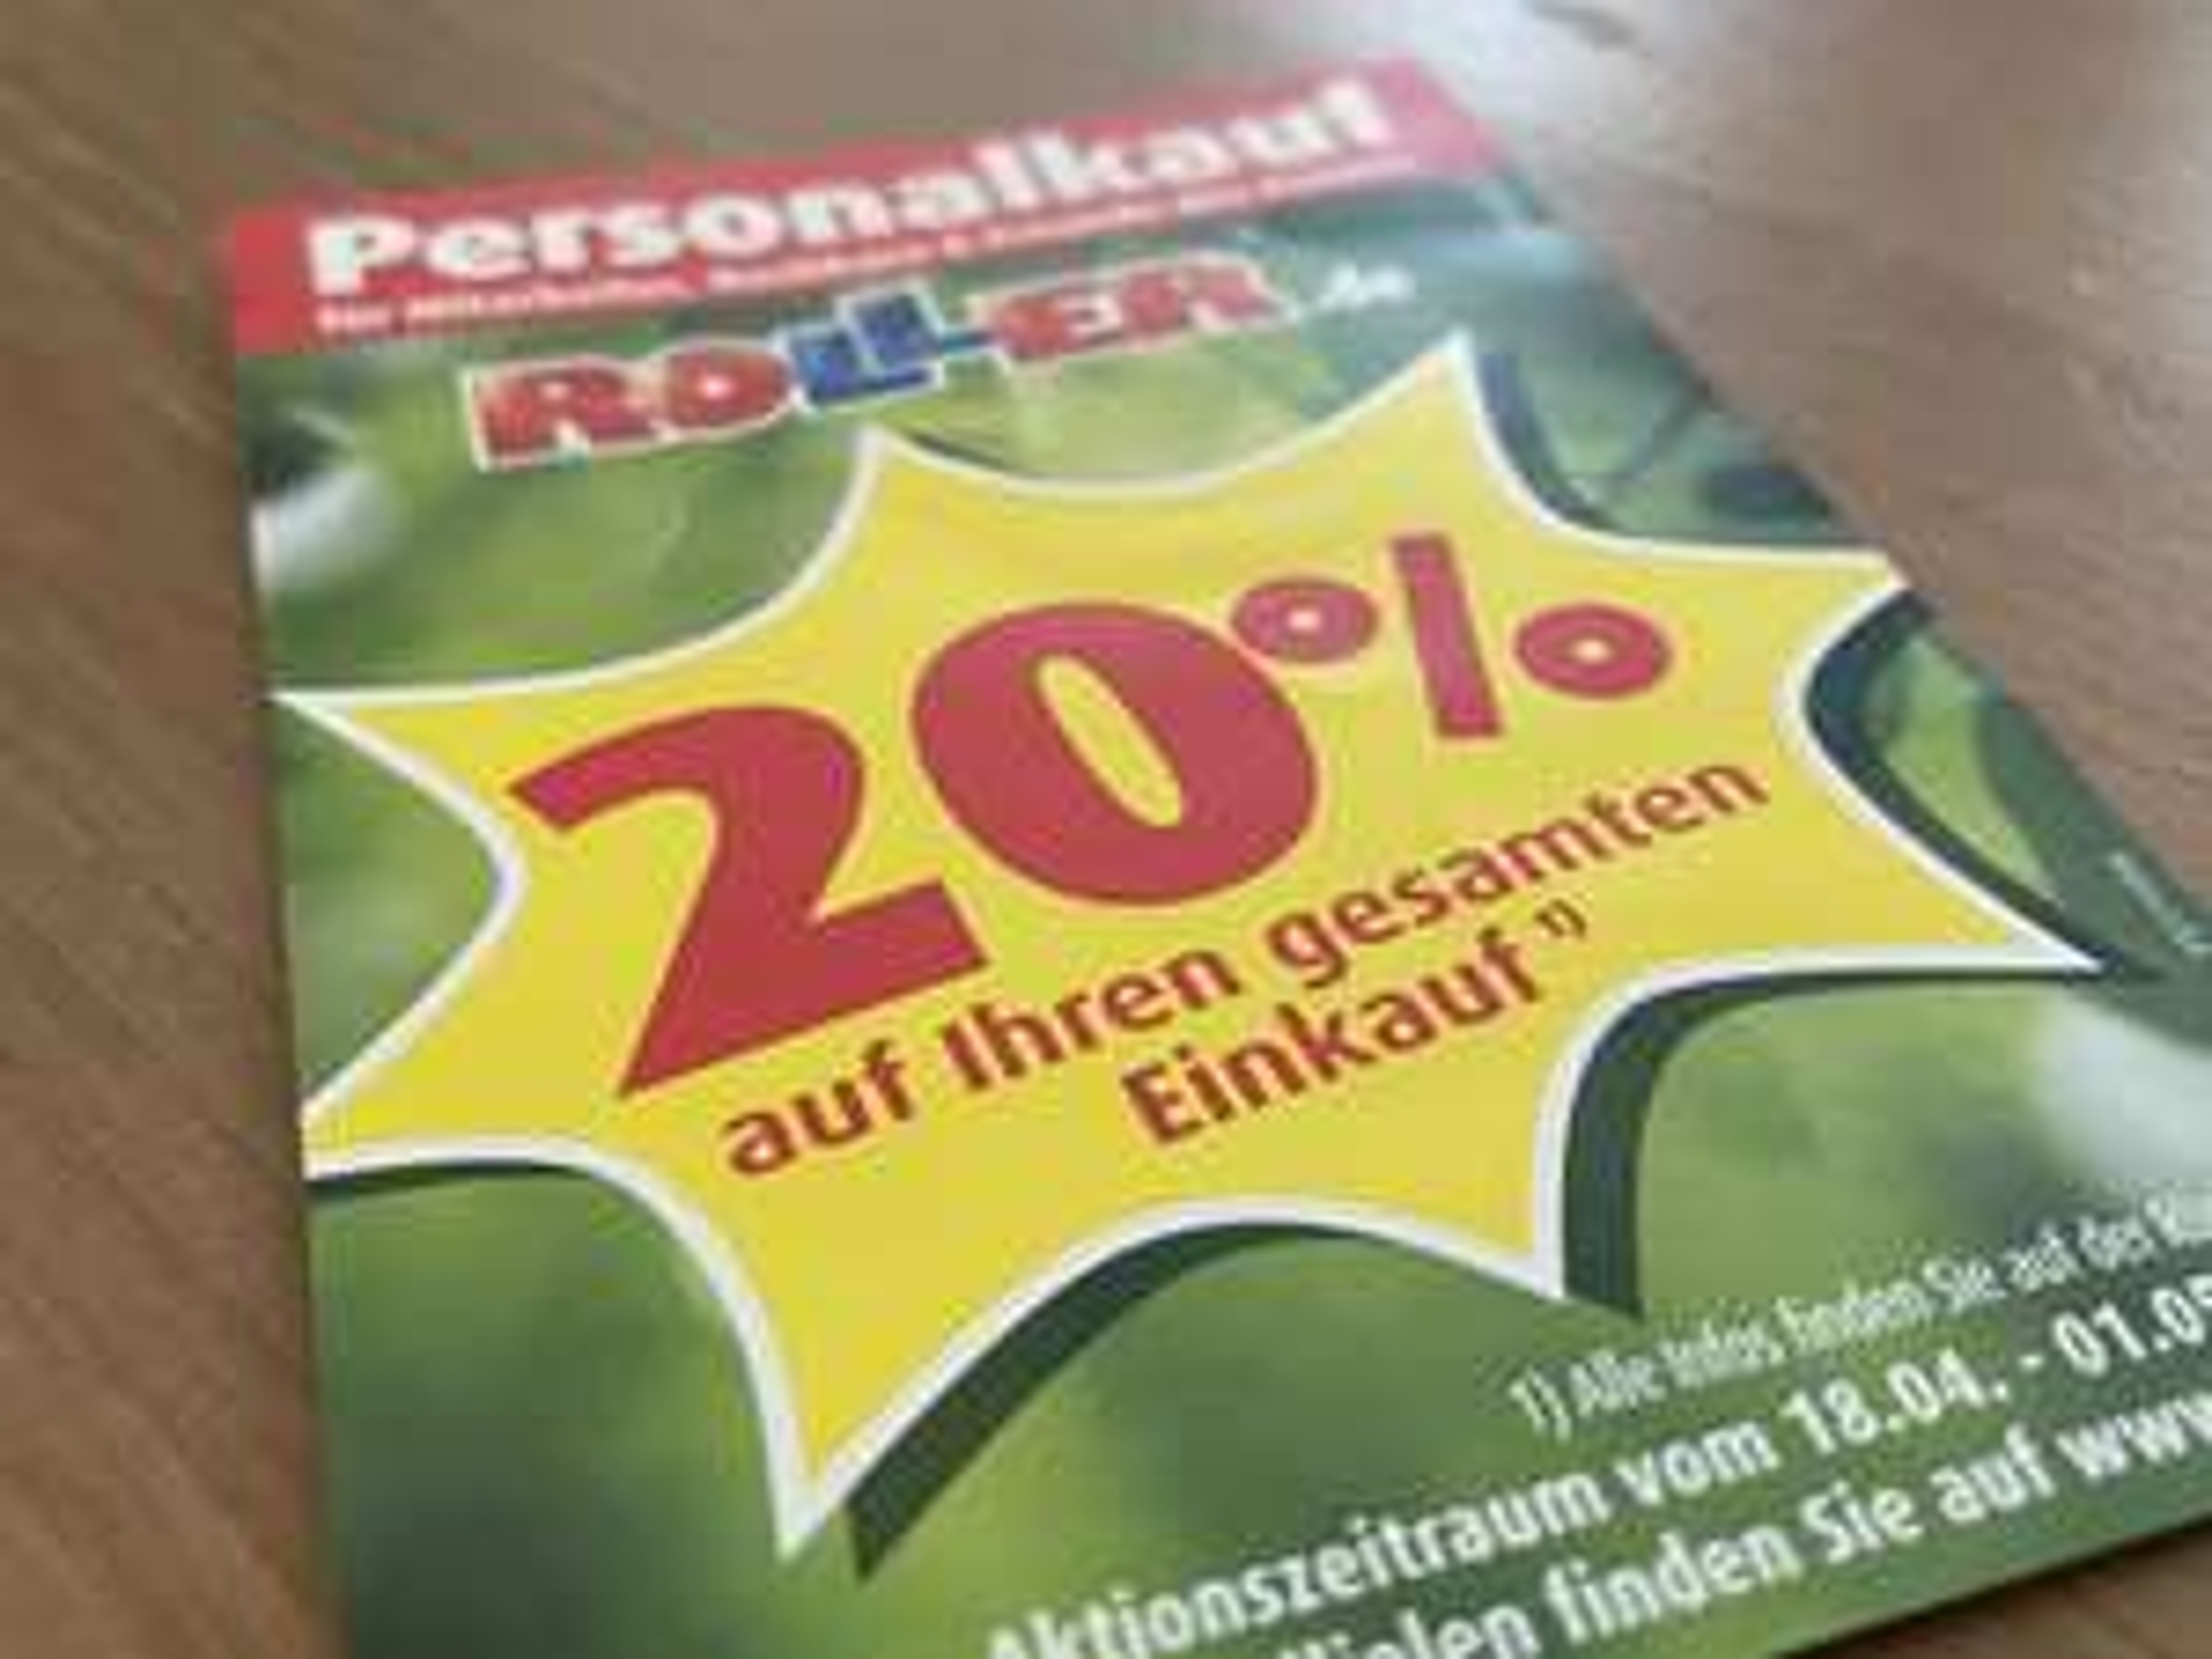 Roller: 20% auf (fast) alles [Filiale + Online]